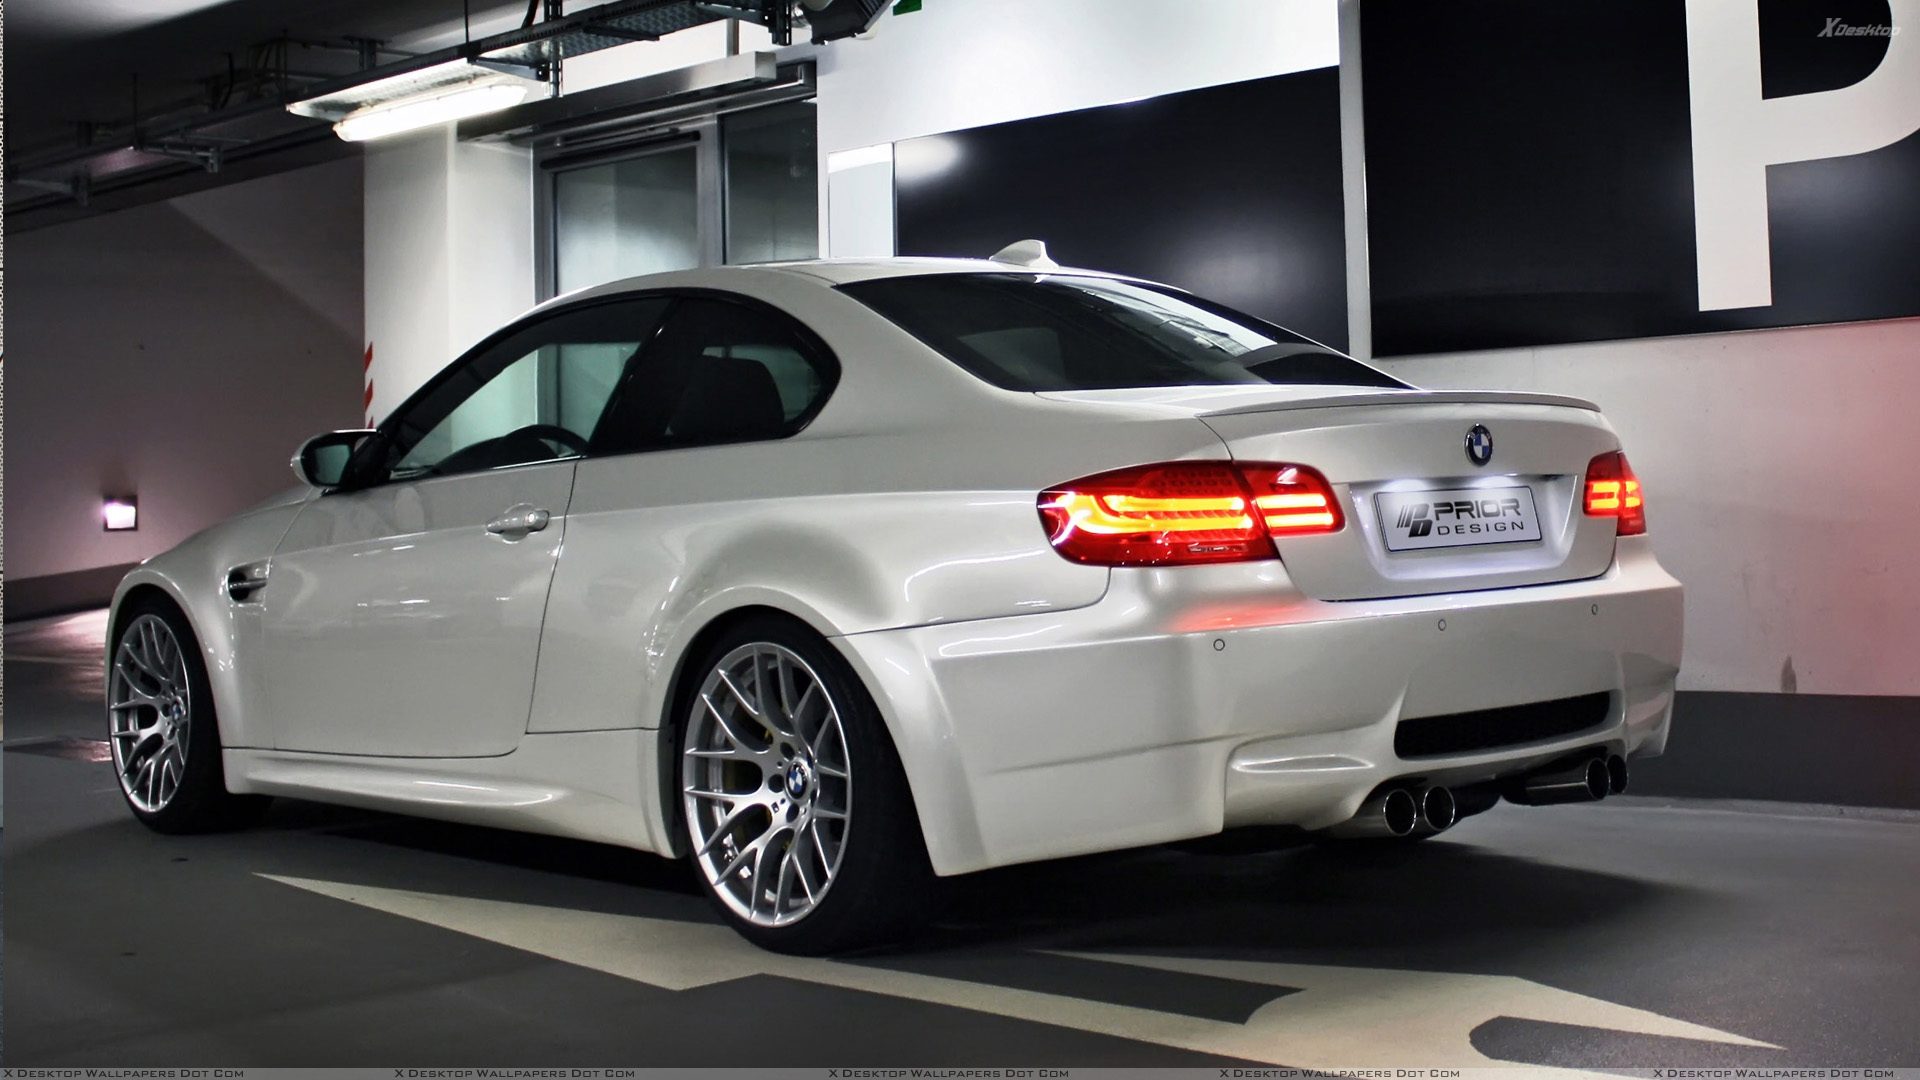 99+ BMW E92 Wallpapers on WallpaperSafari